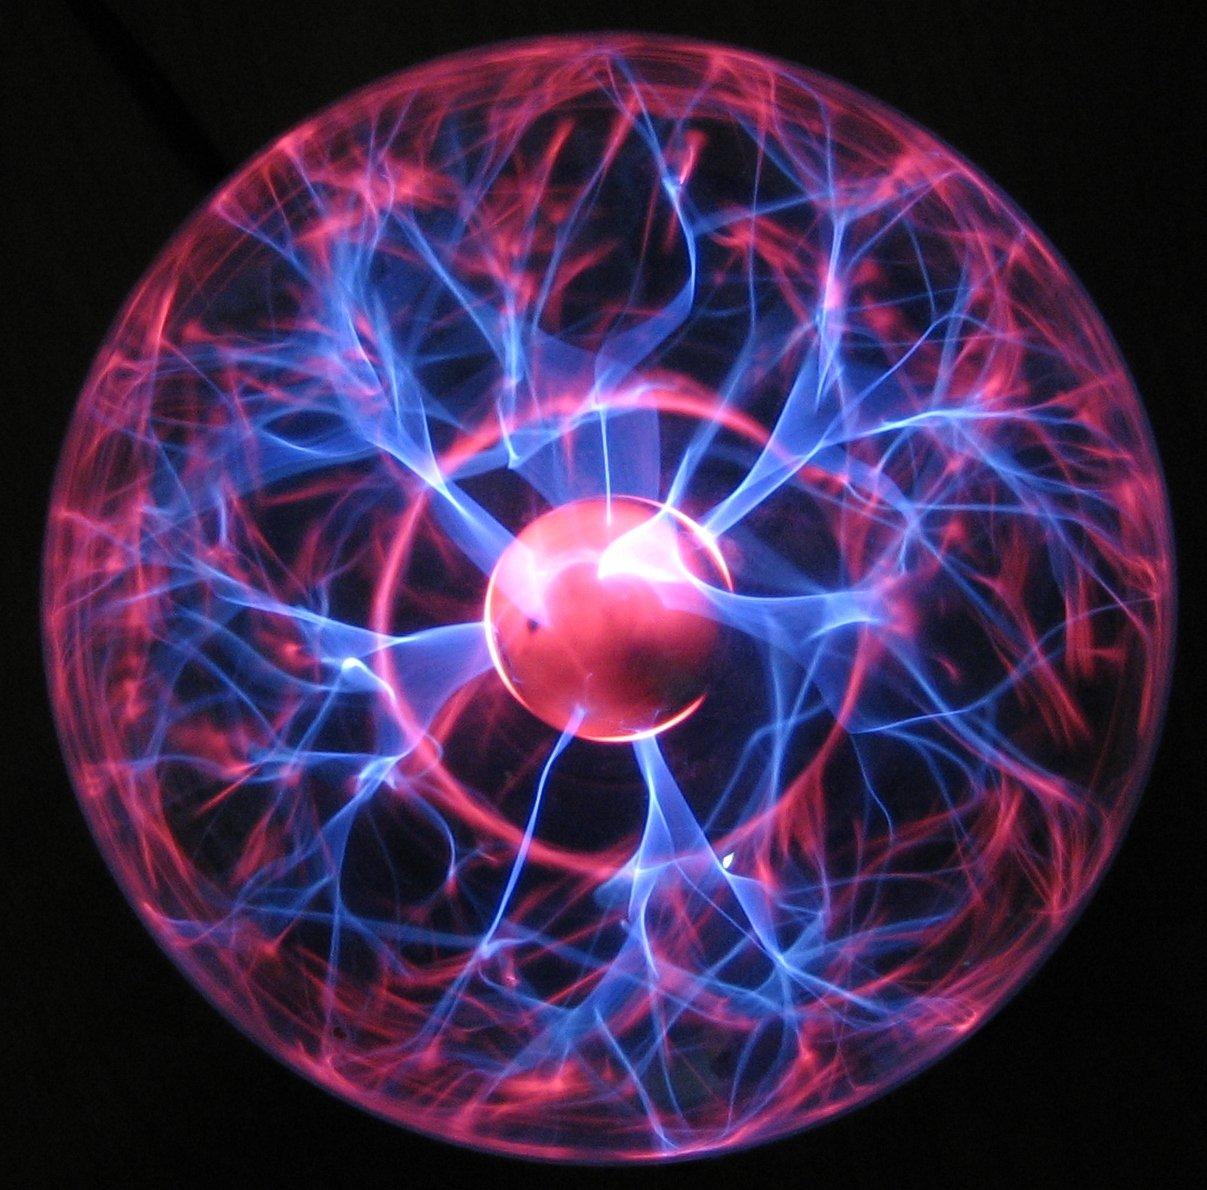 plasma matter picture - HD1207×1190